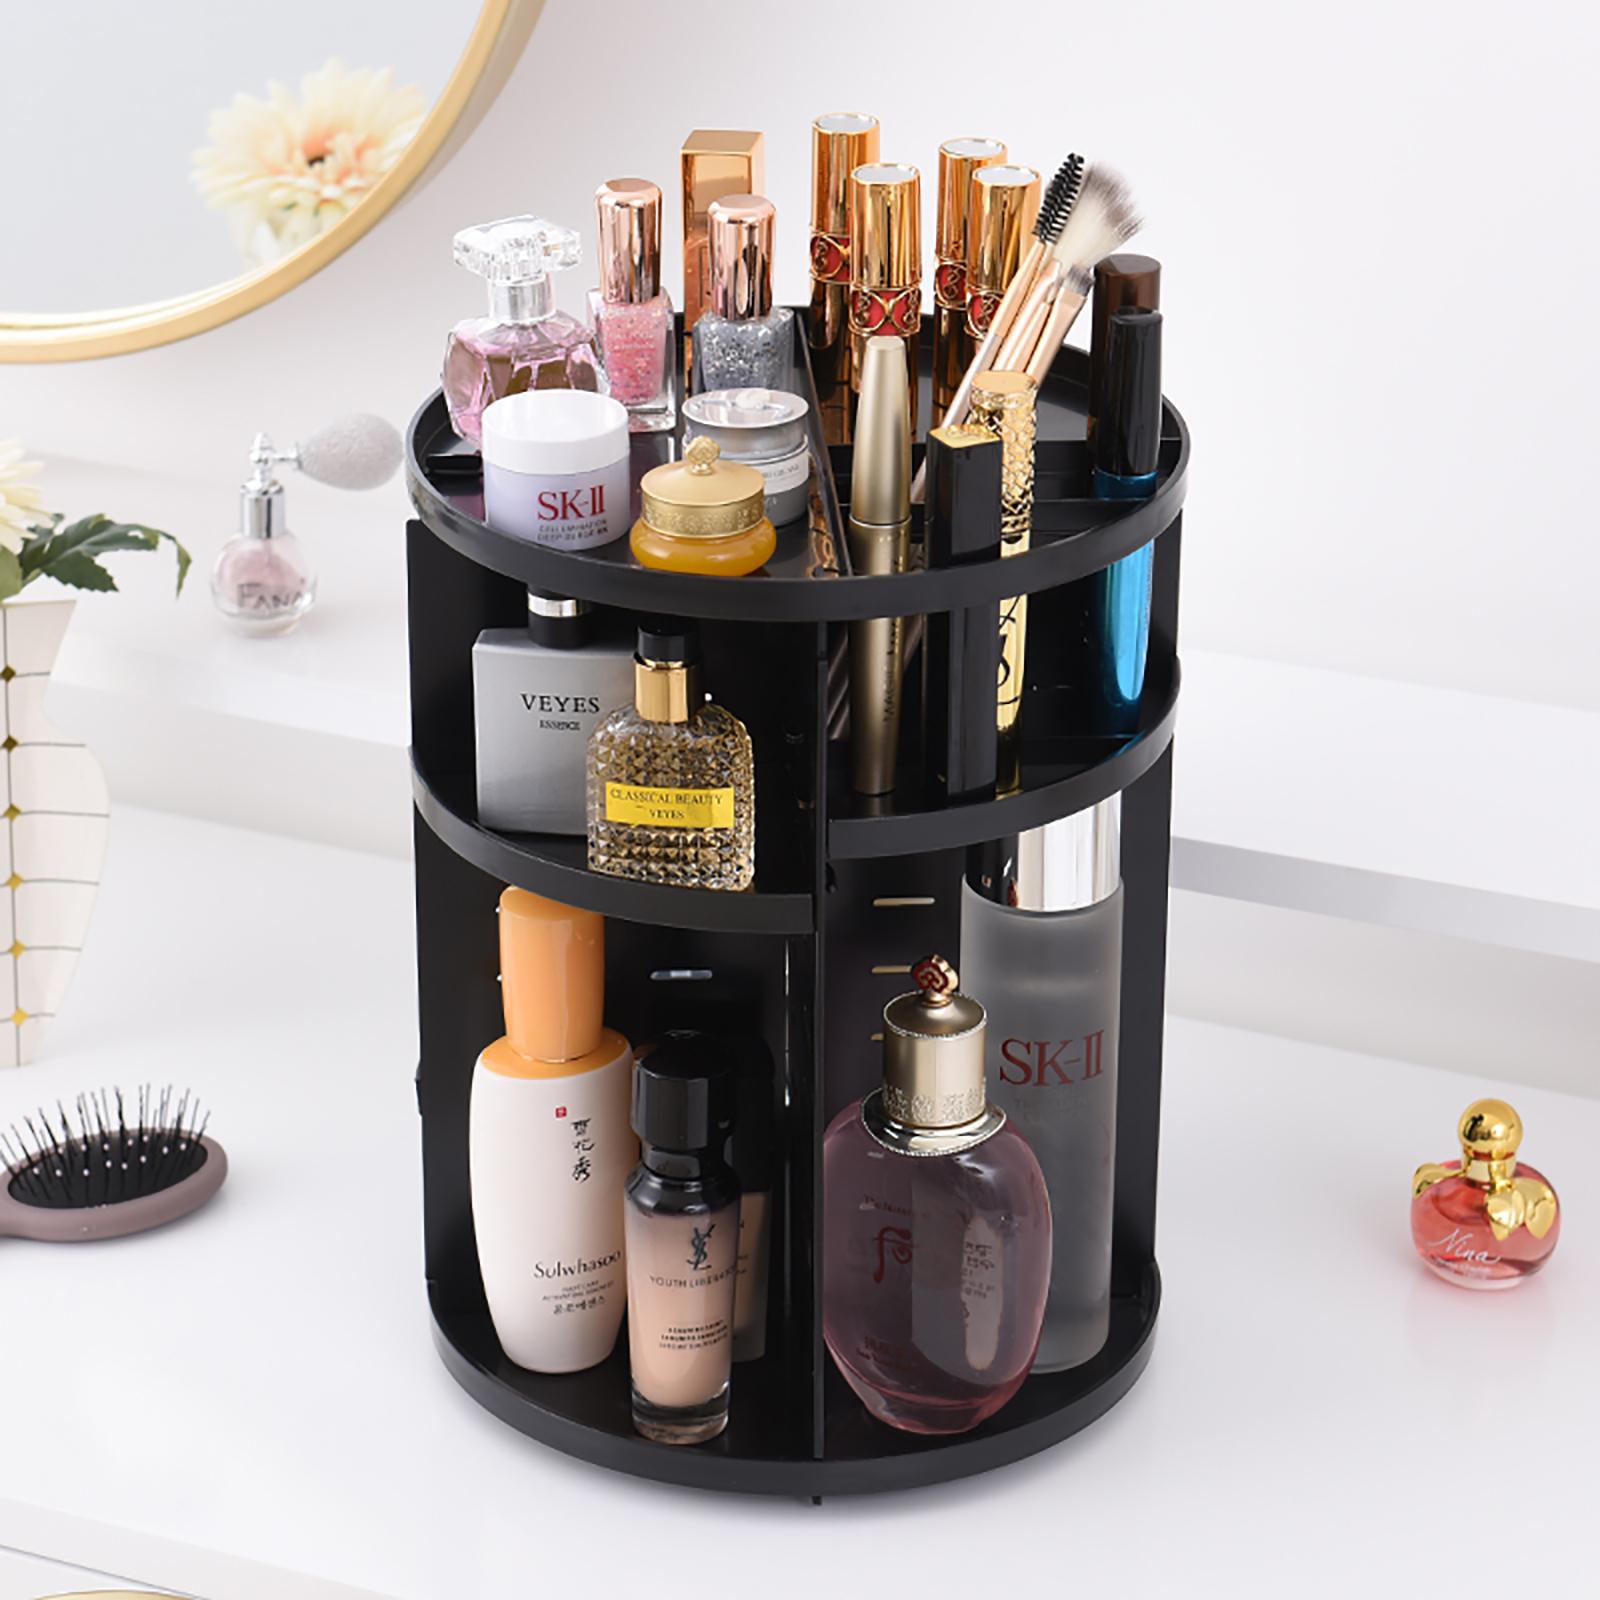 Details about Makeup Cosmetic Rack Holder 360 Degree Rotating Organizer Storage Box Case Black